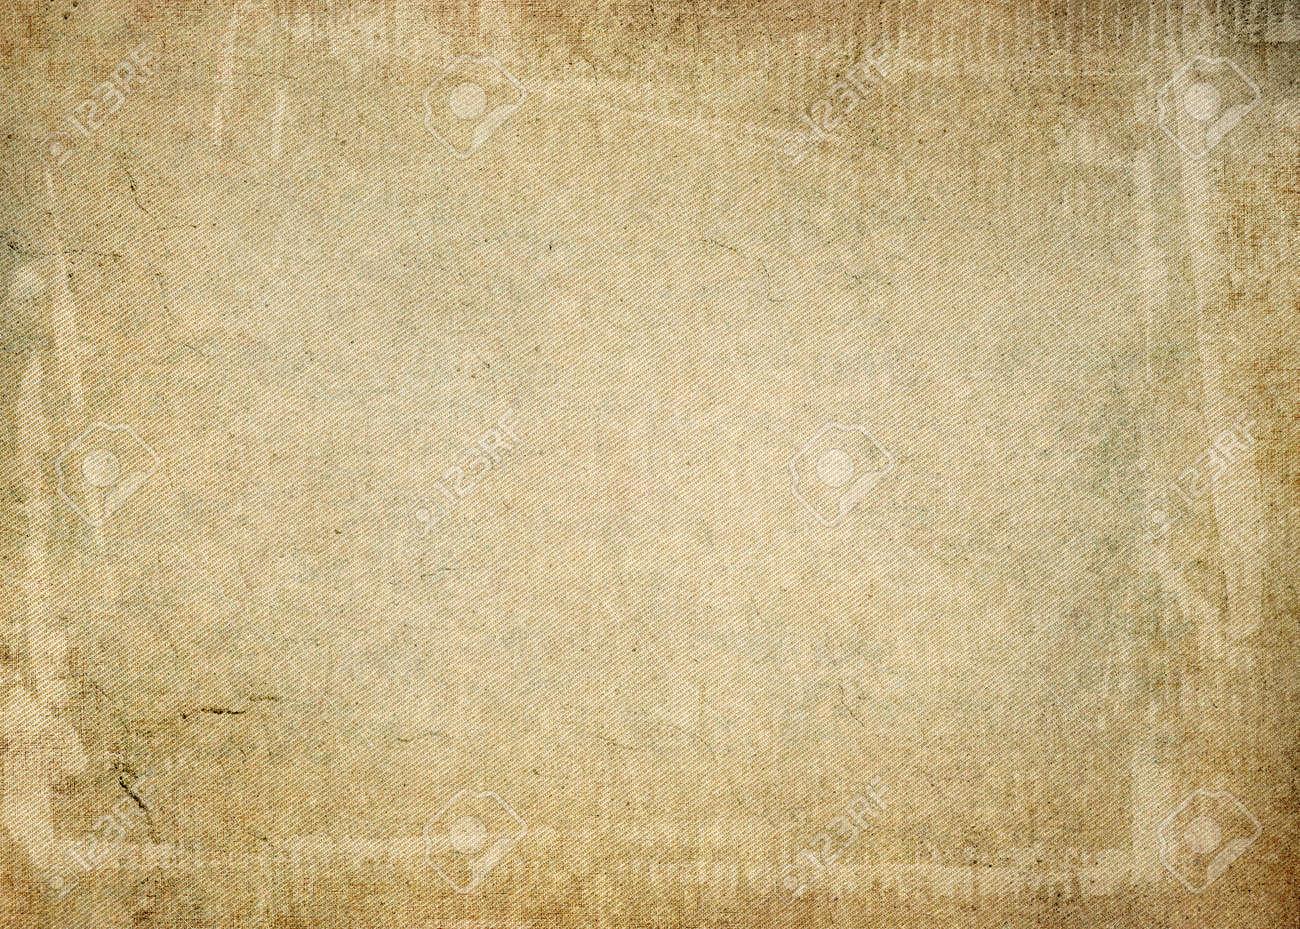 Grunge Background Old Paper Texture Background